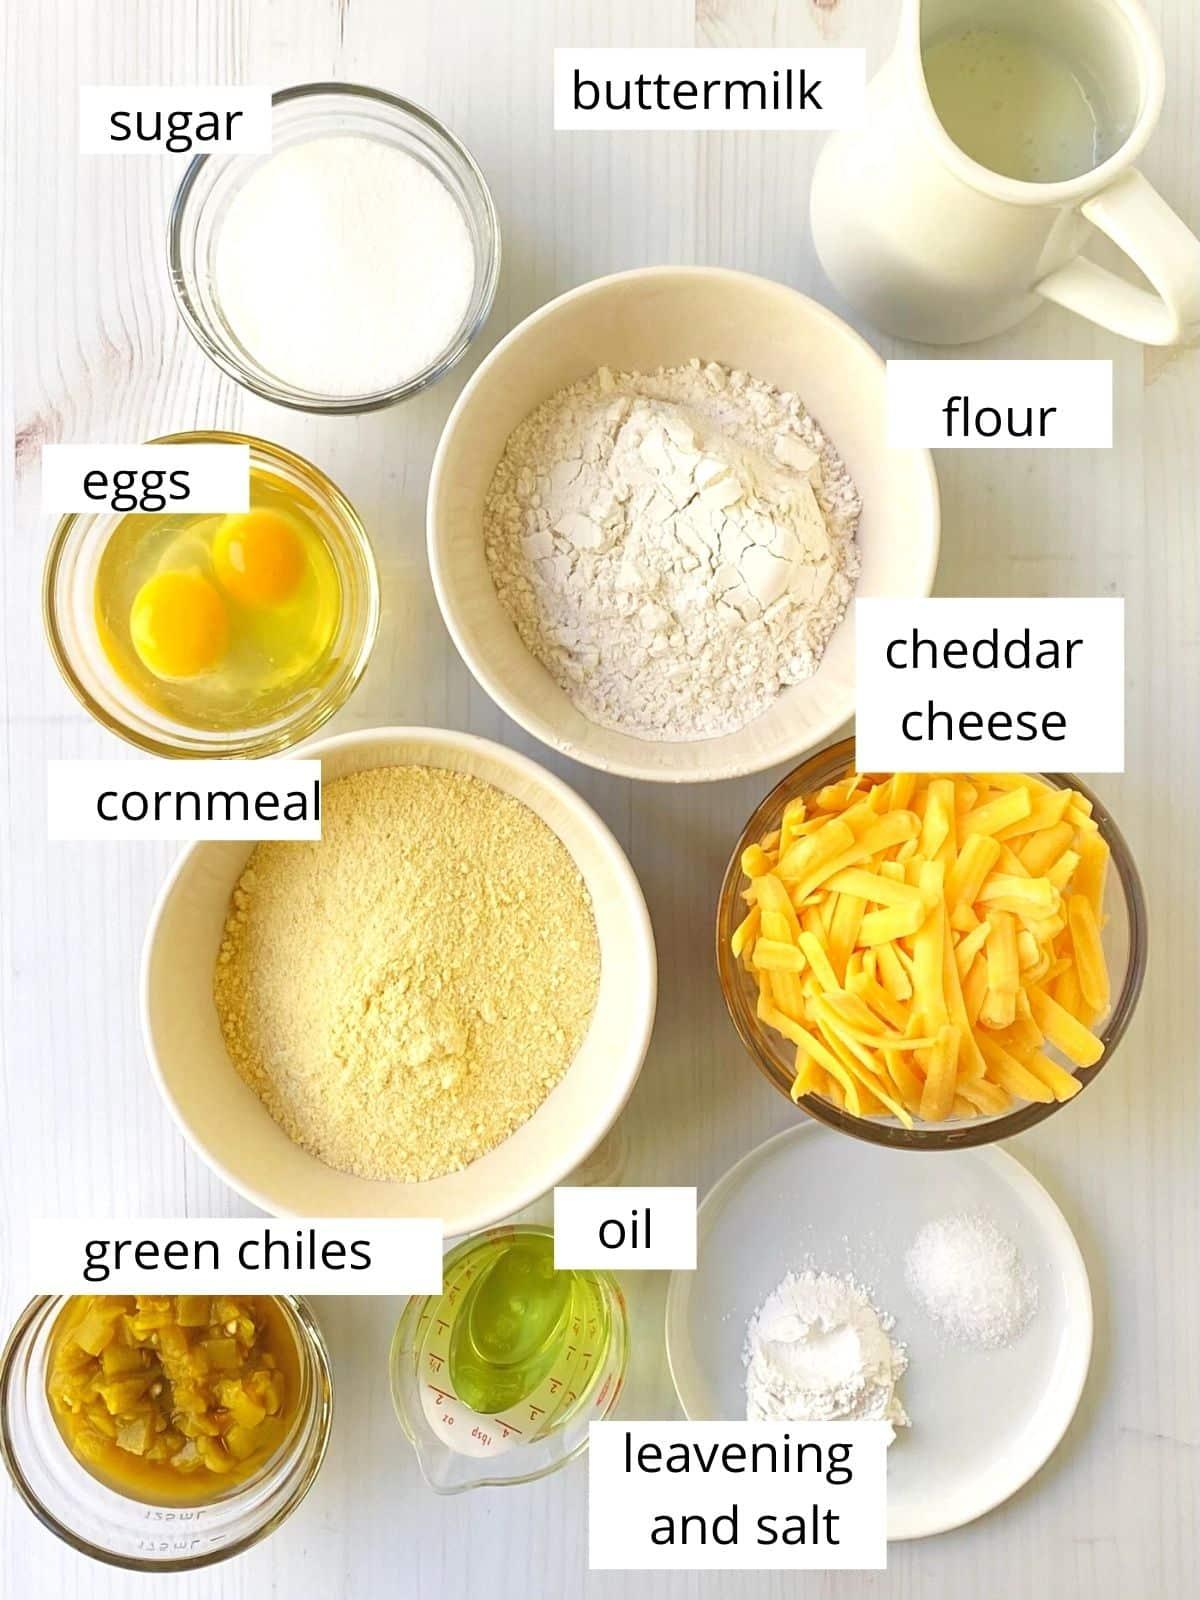 green chile cheddar cornbread ingredients.